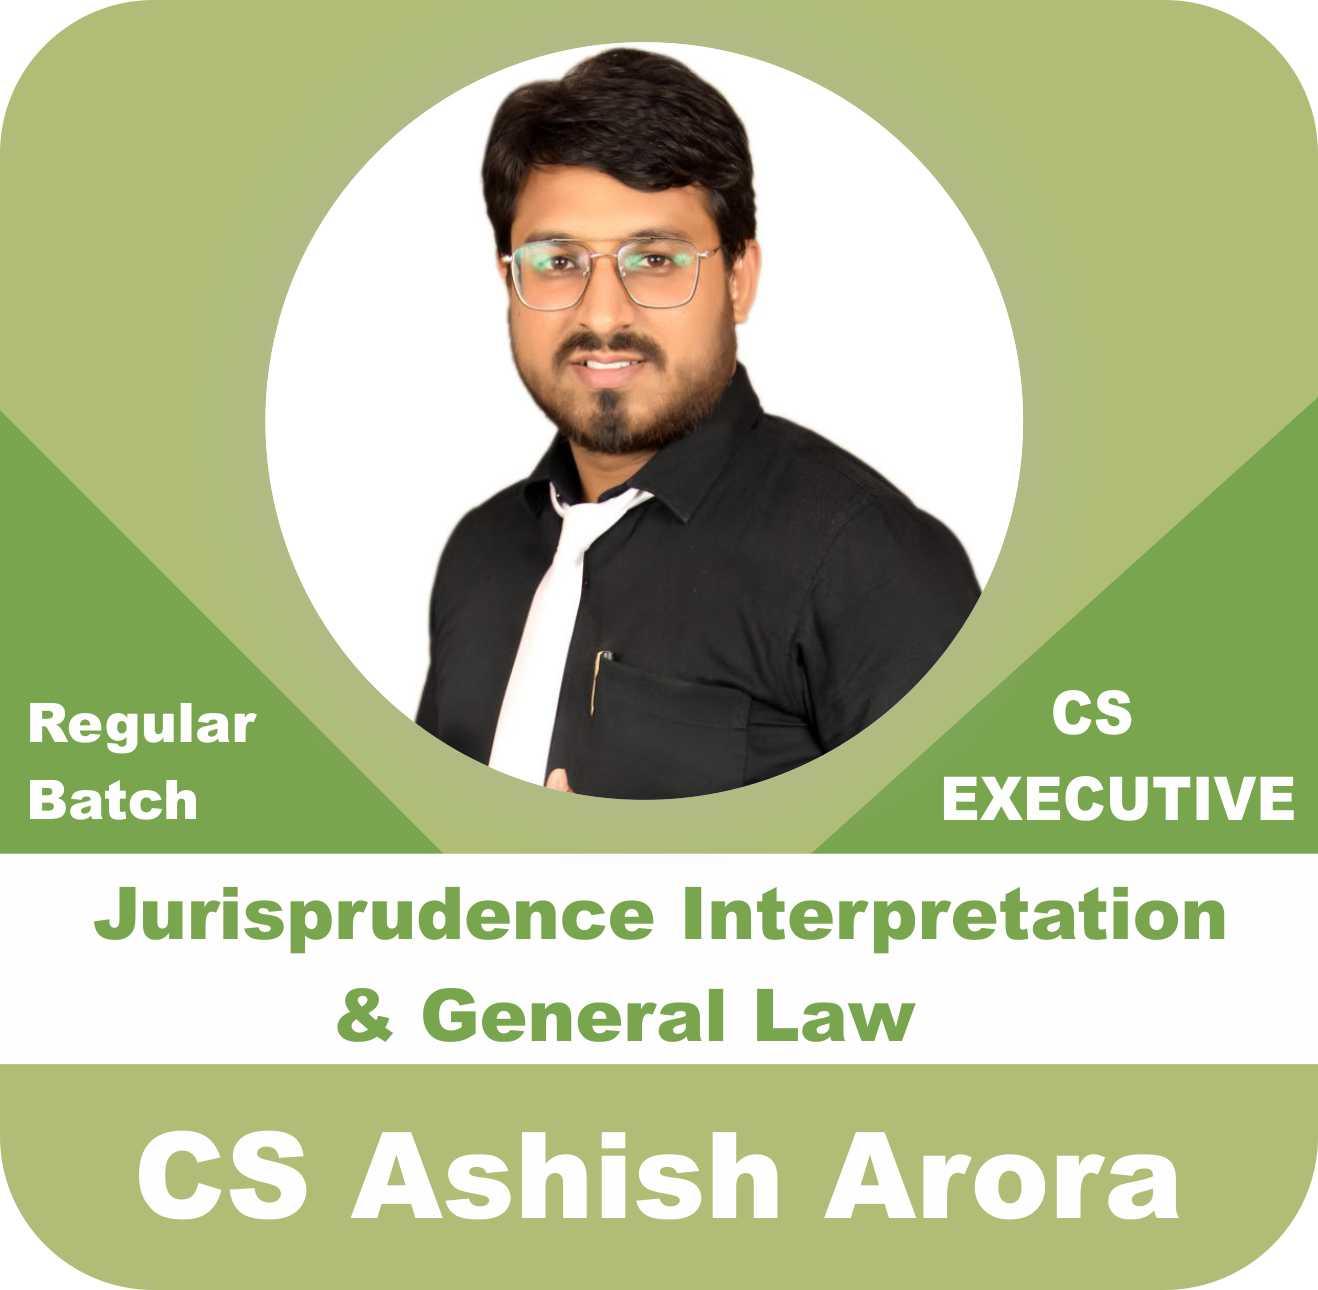 Jurisprudence Interpretation and General Law Regular Batch